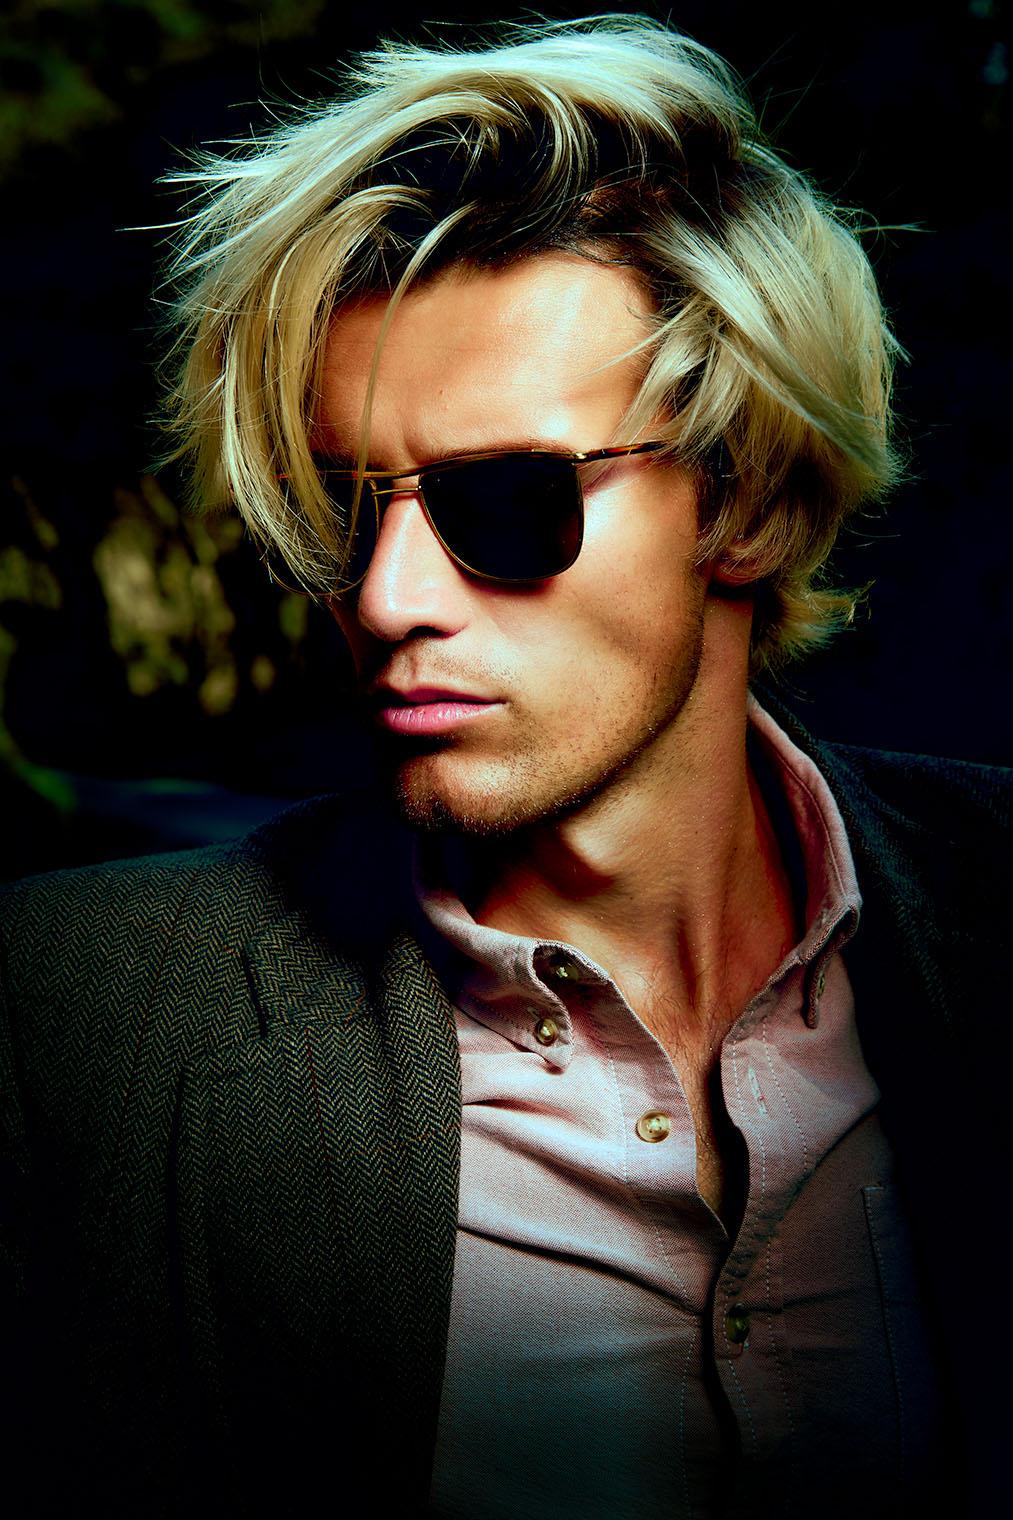 fashion portrait of man wearing sunglasses highly stylized portrait photograph